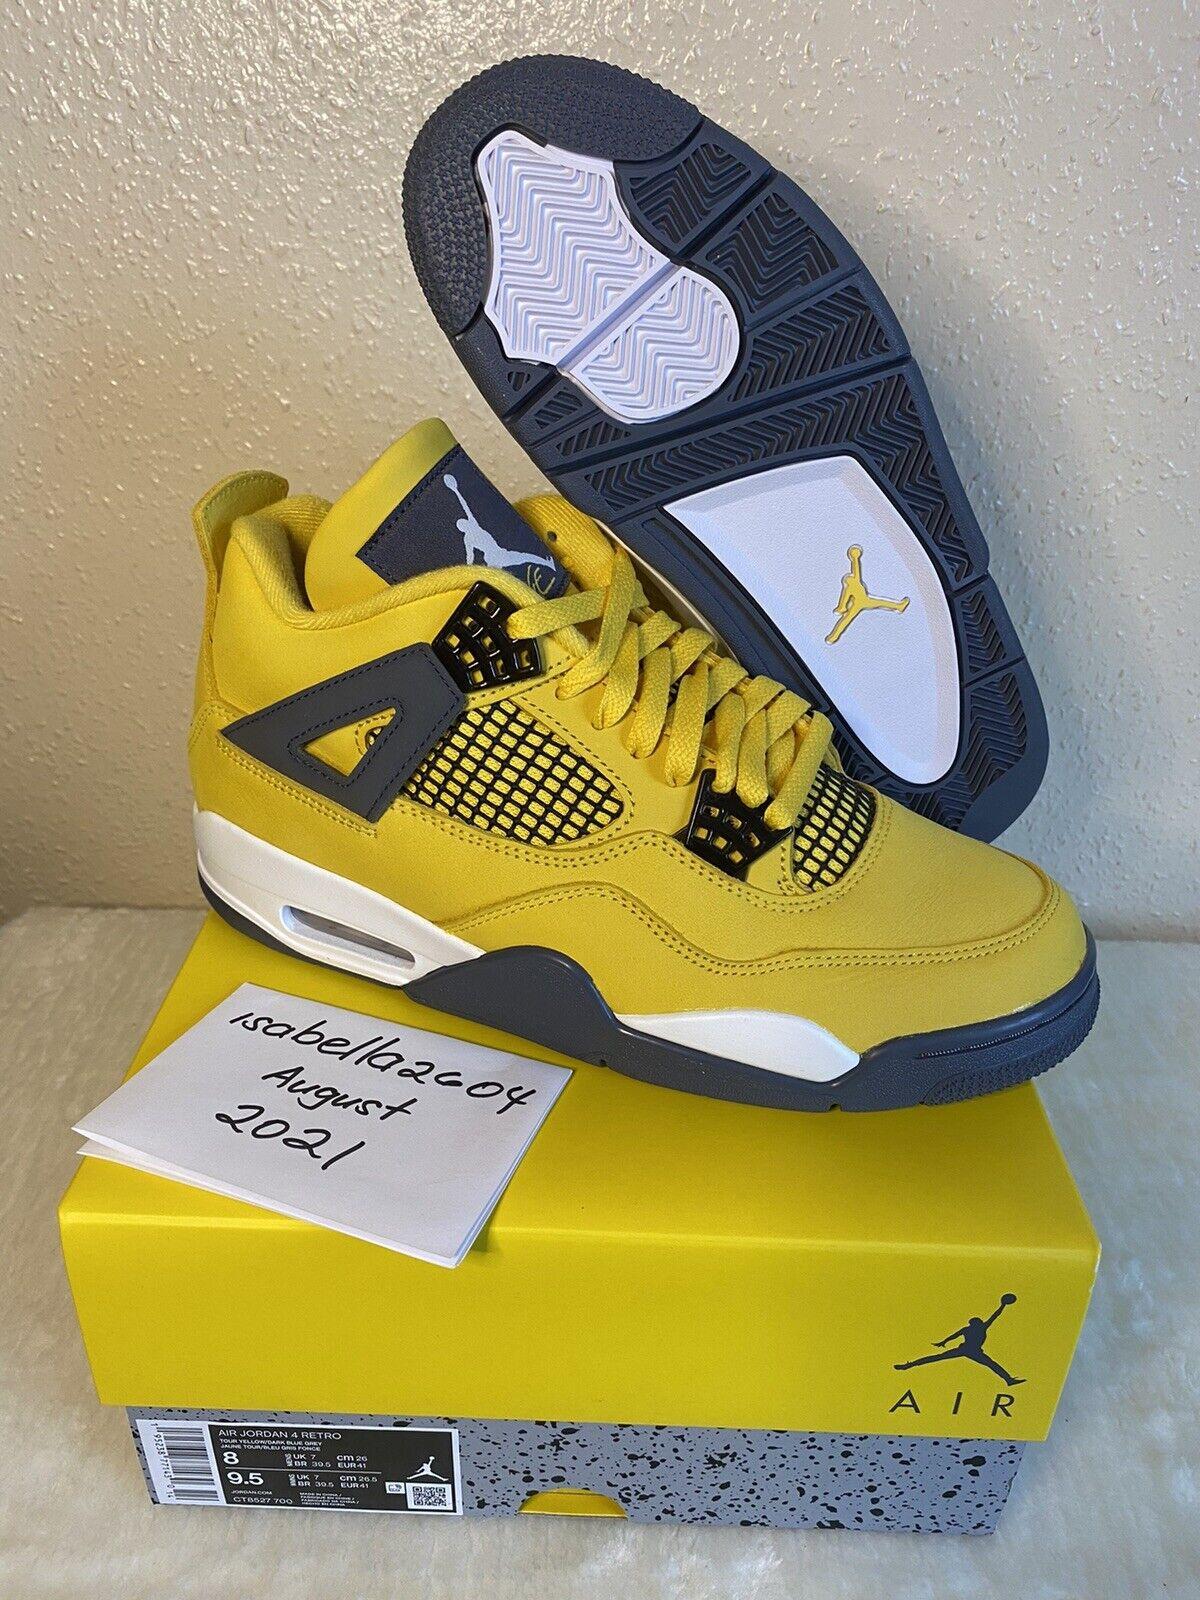 Nike Air Jordan 4 Lightning 2021 UK7